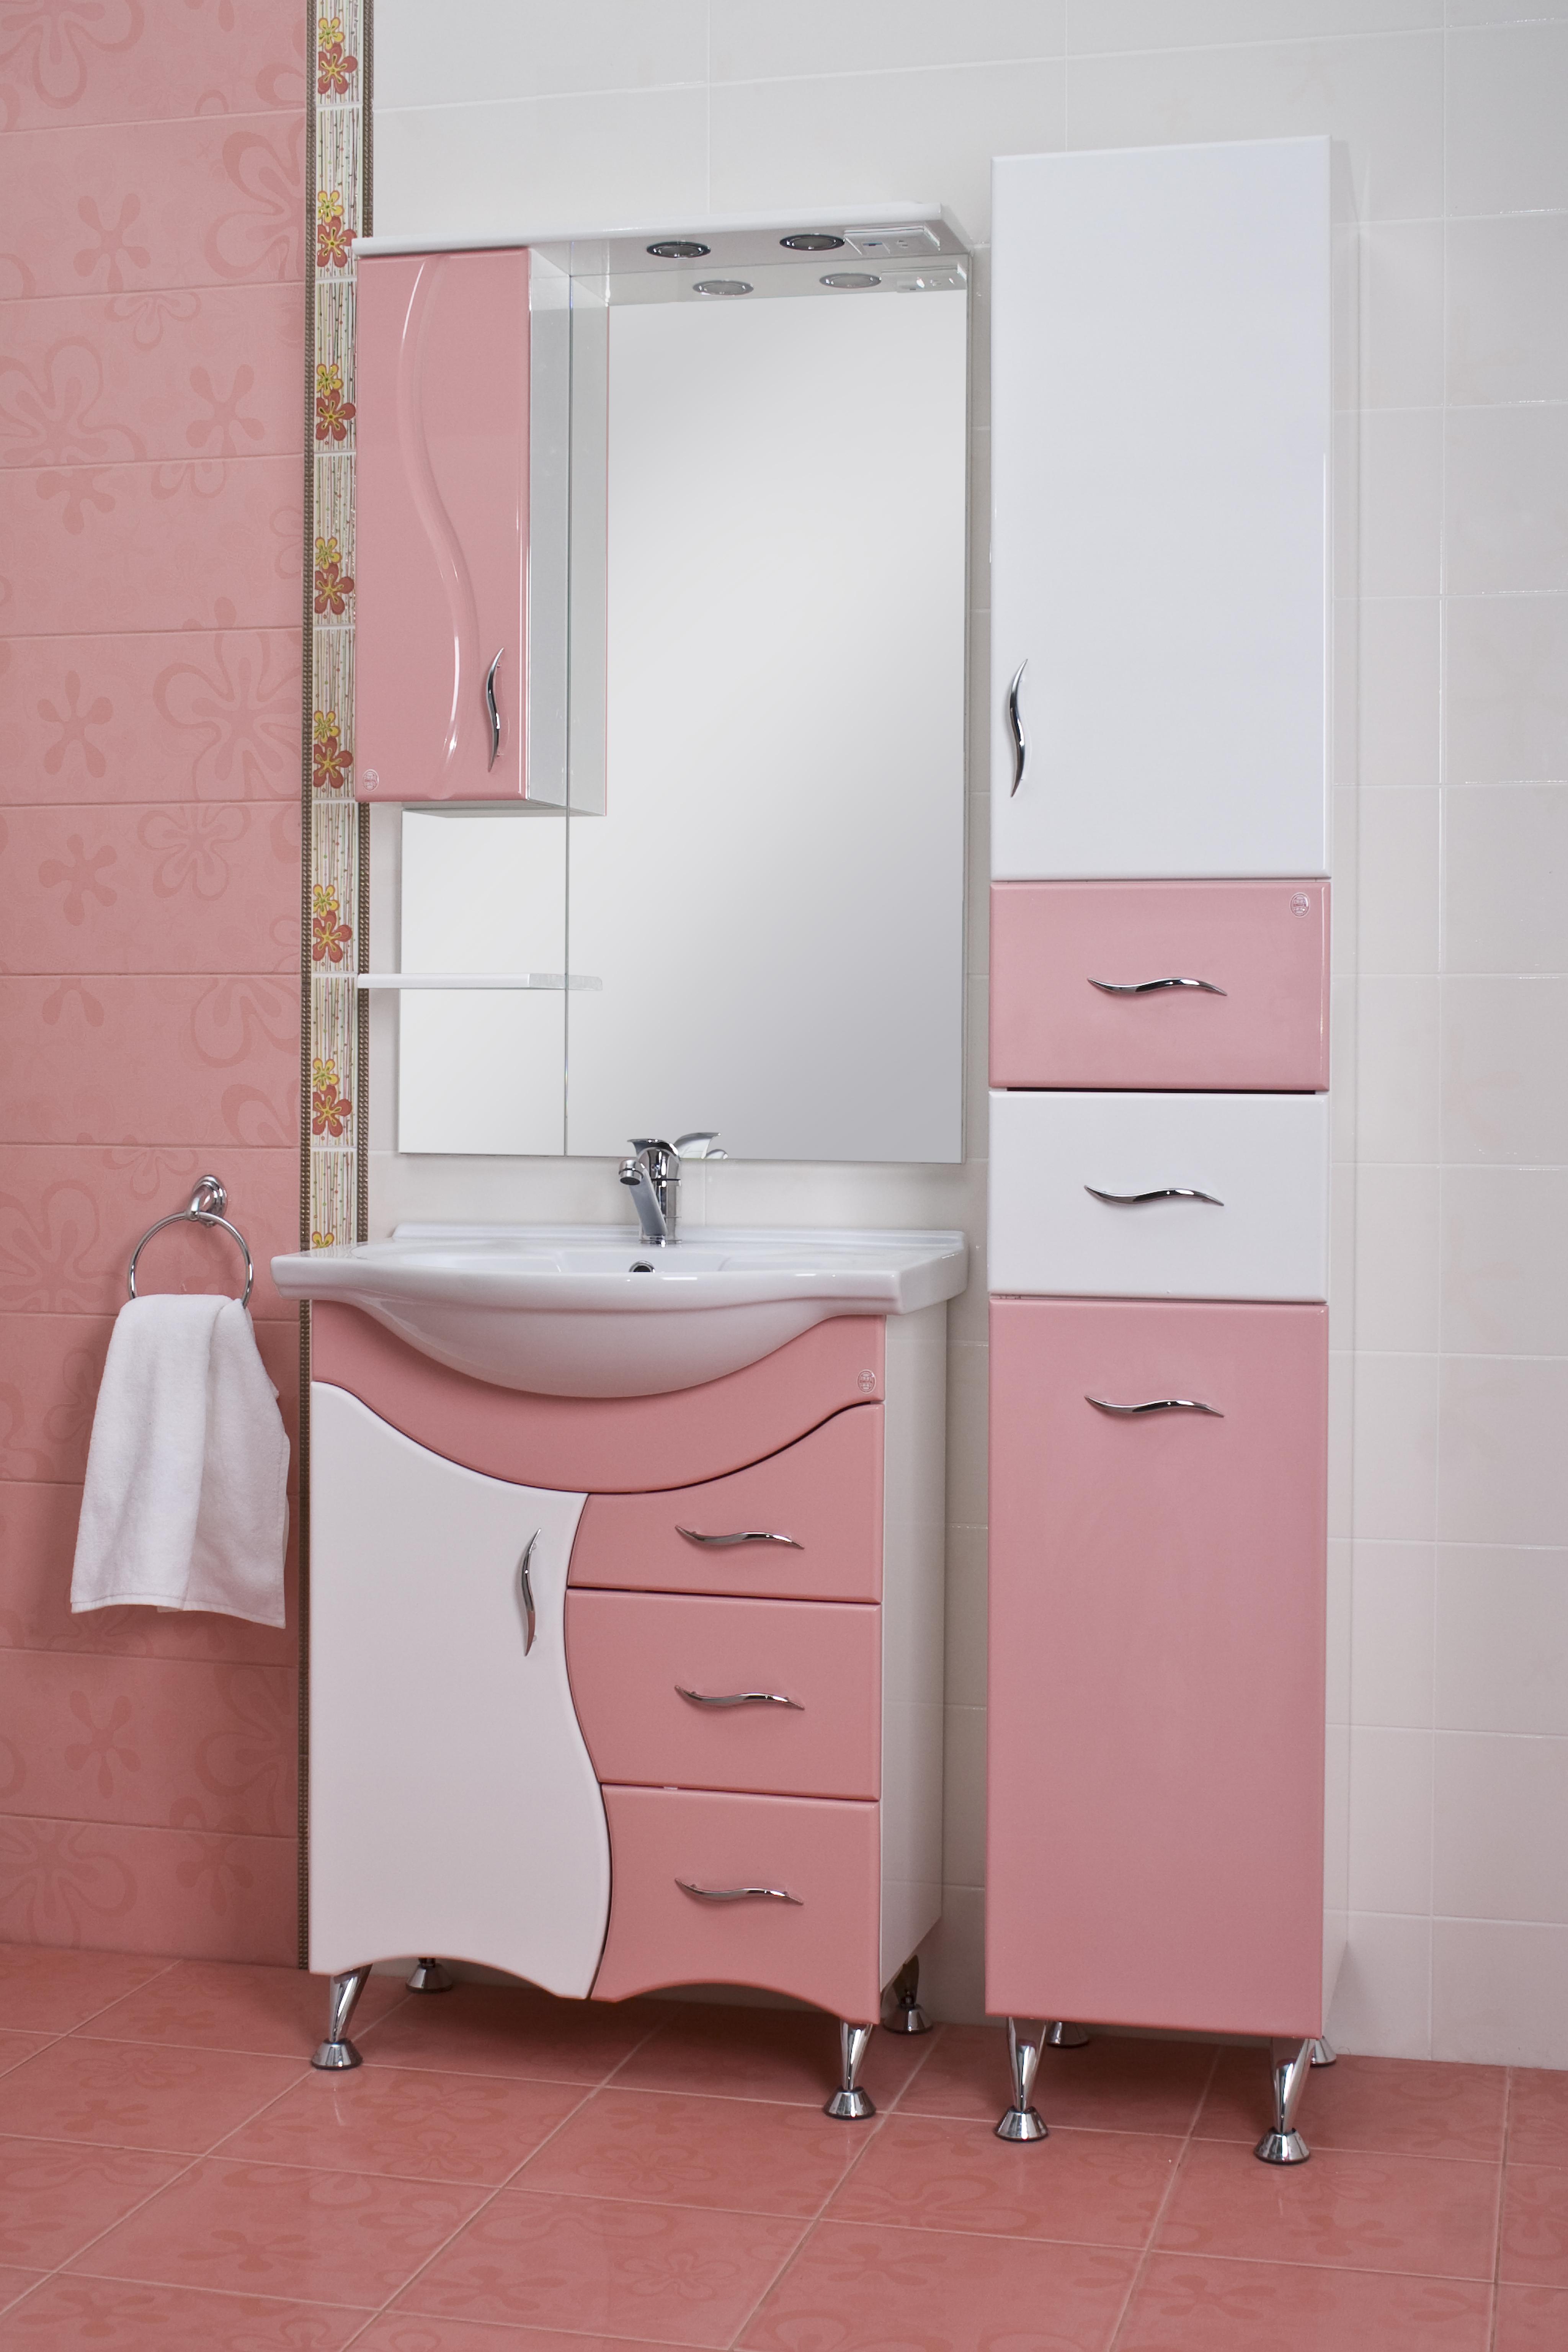 зеркало в ванную цена купить зеркало в ванную киев недорого